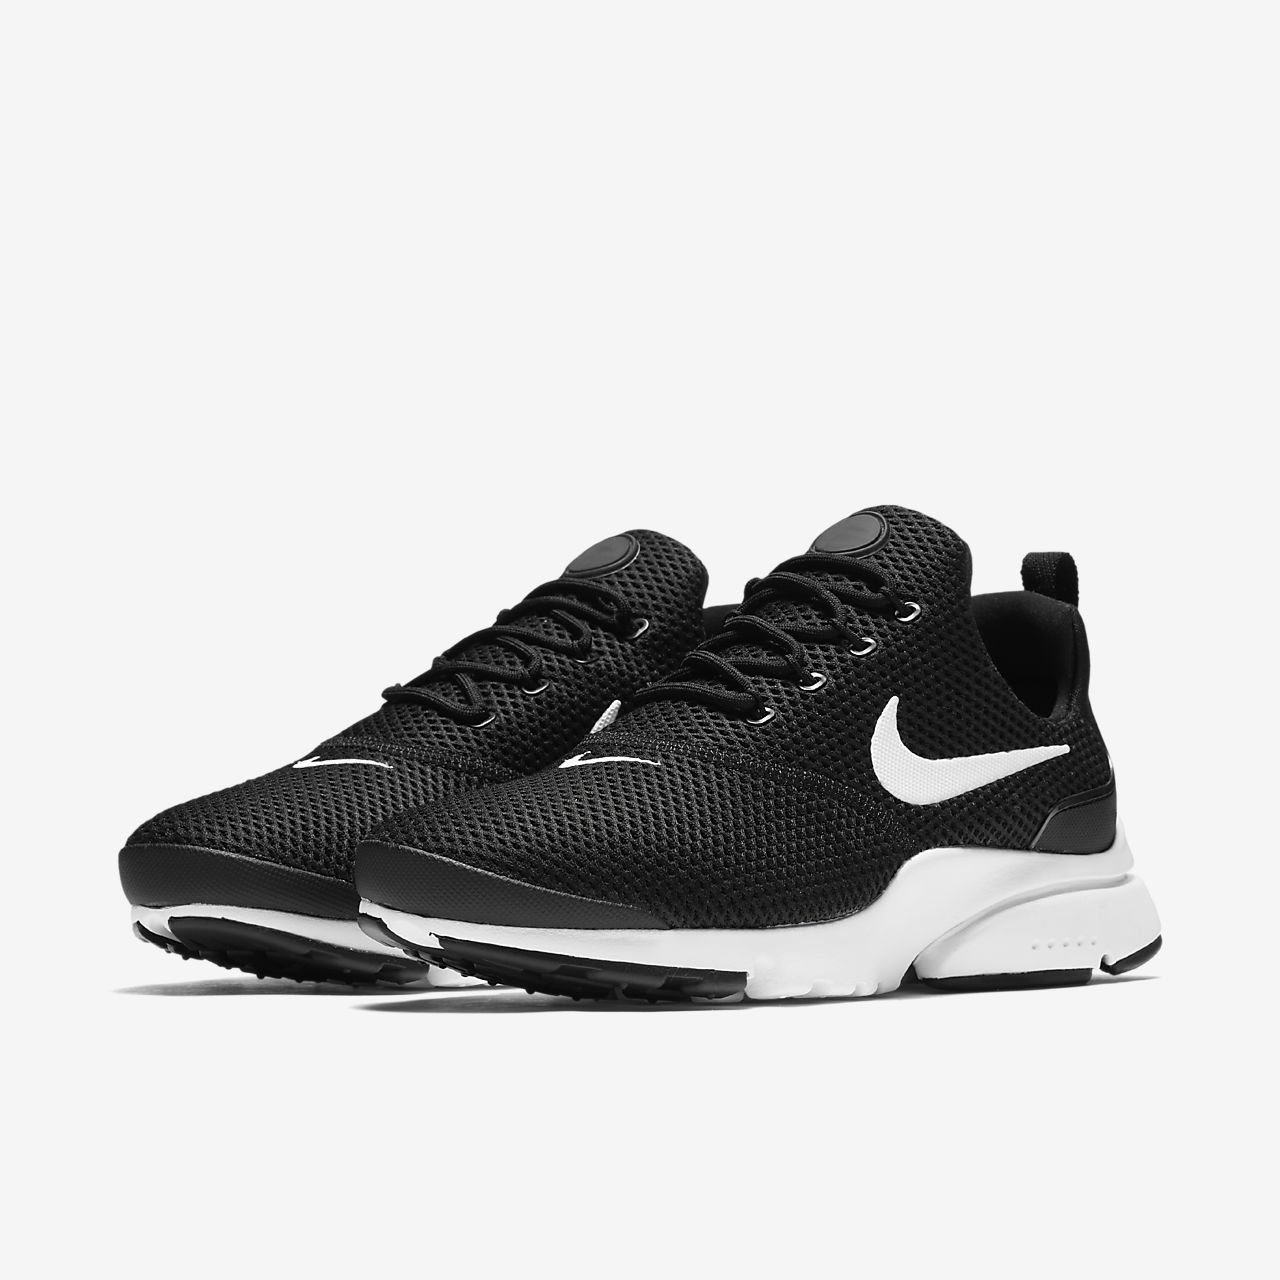 7571473eba Nike Presto Fly Women's Shoe. Nike.com GB